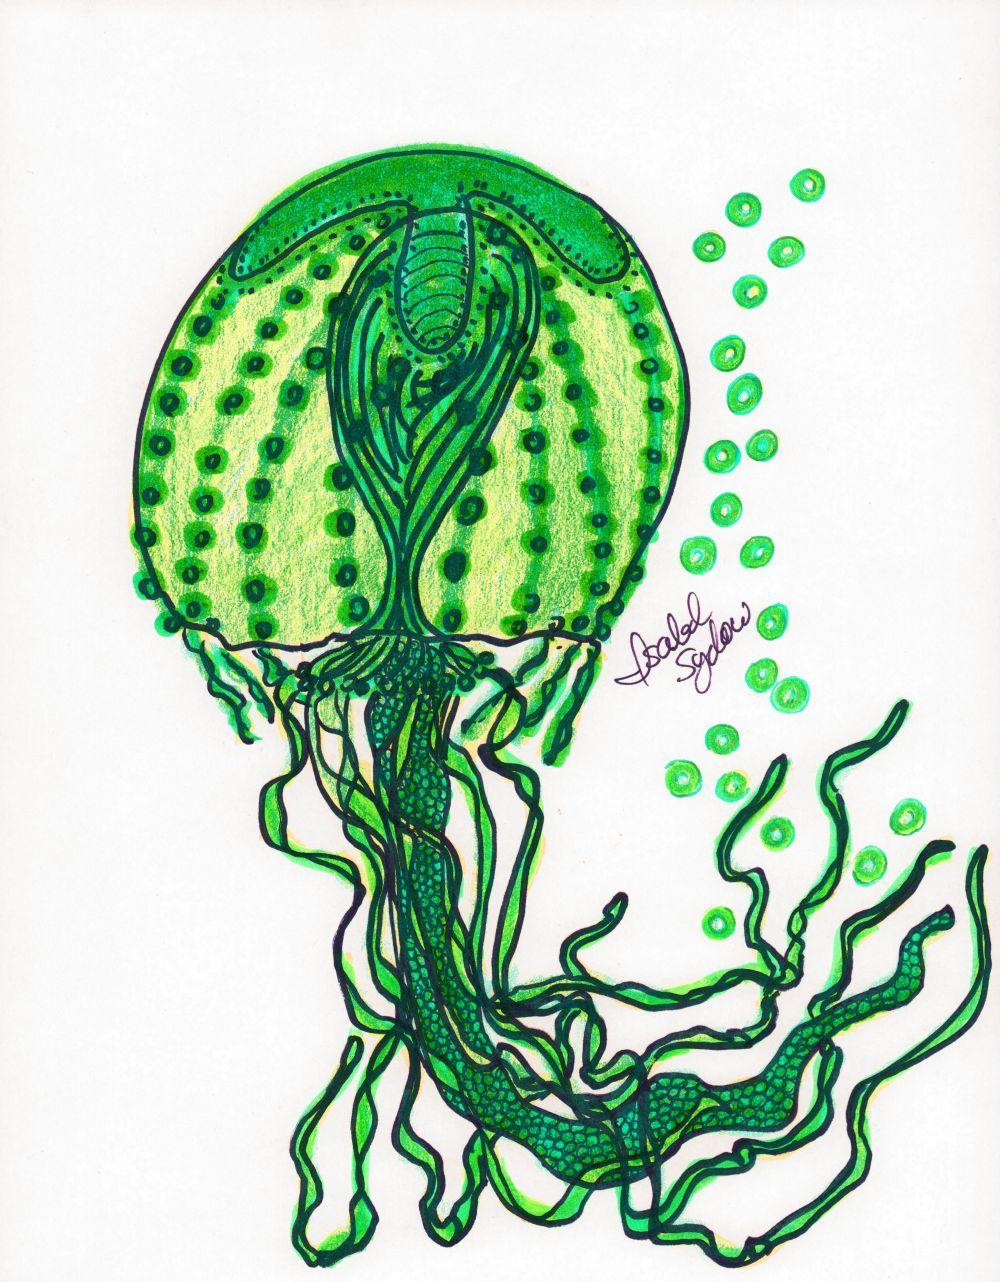 Jelly Fish Greenest Green